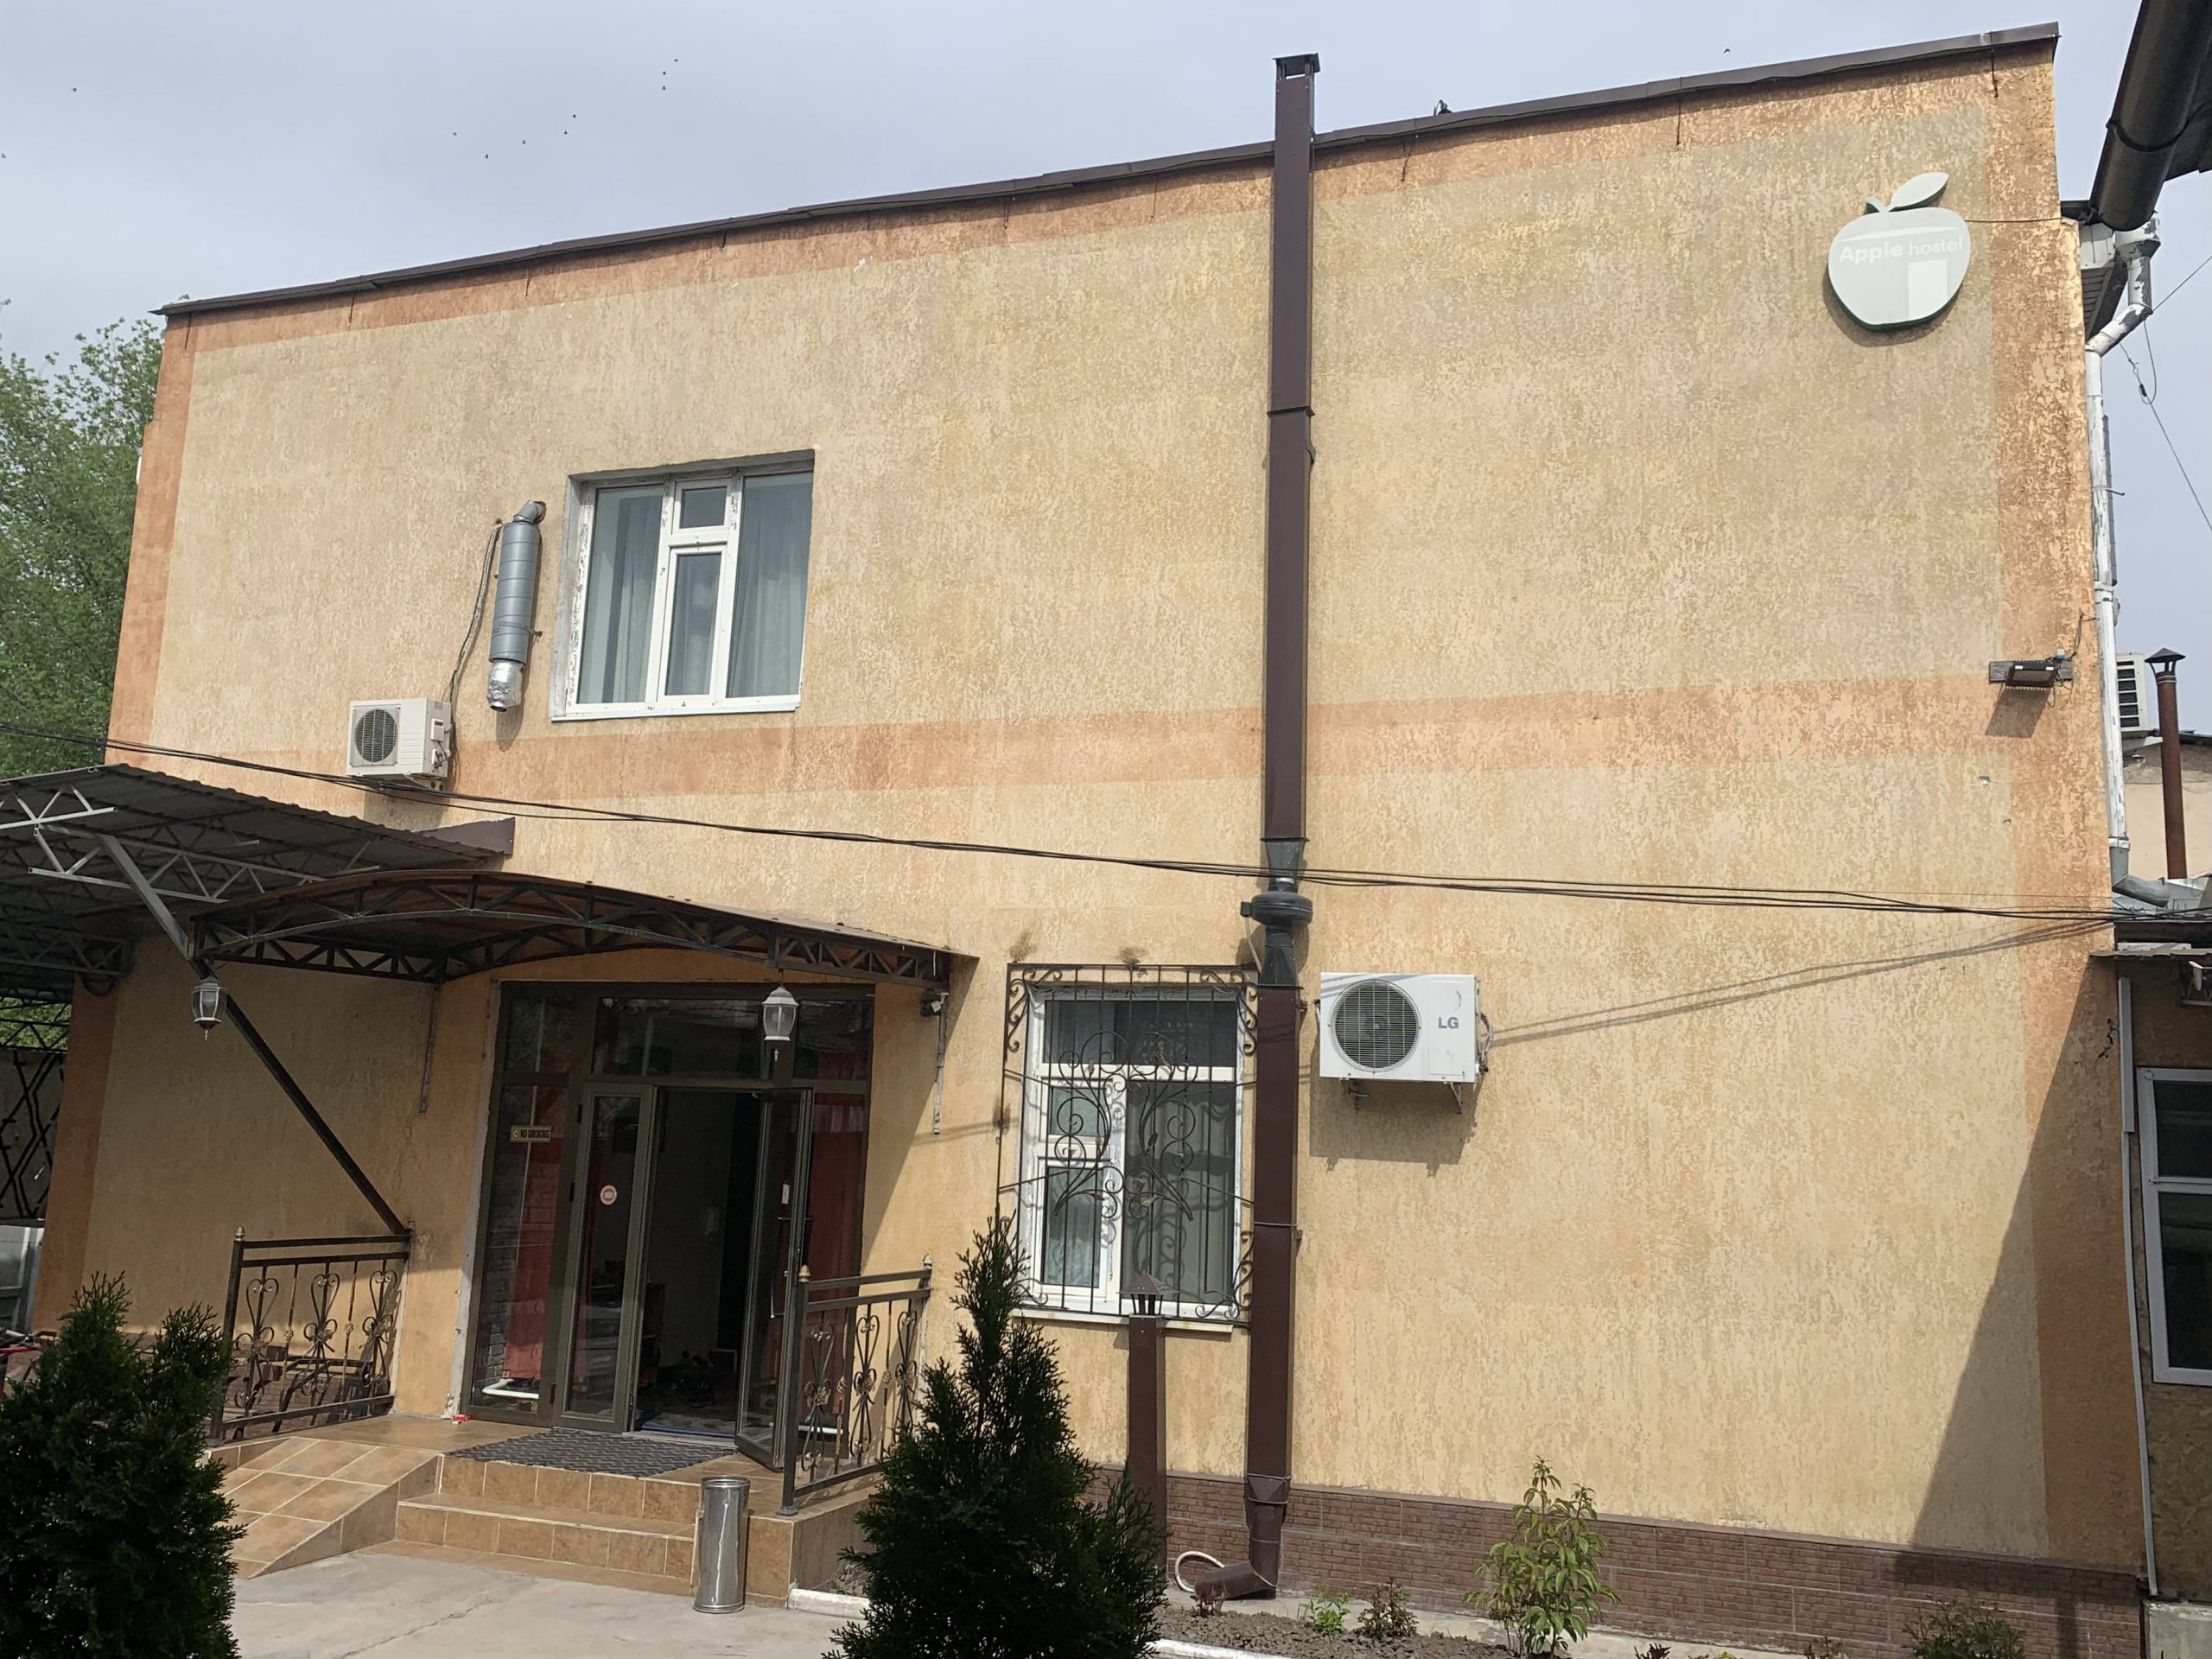 How to get to Apple Hostel Bishkek (Video Directions)